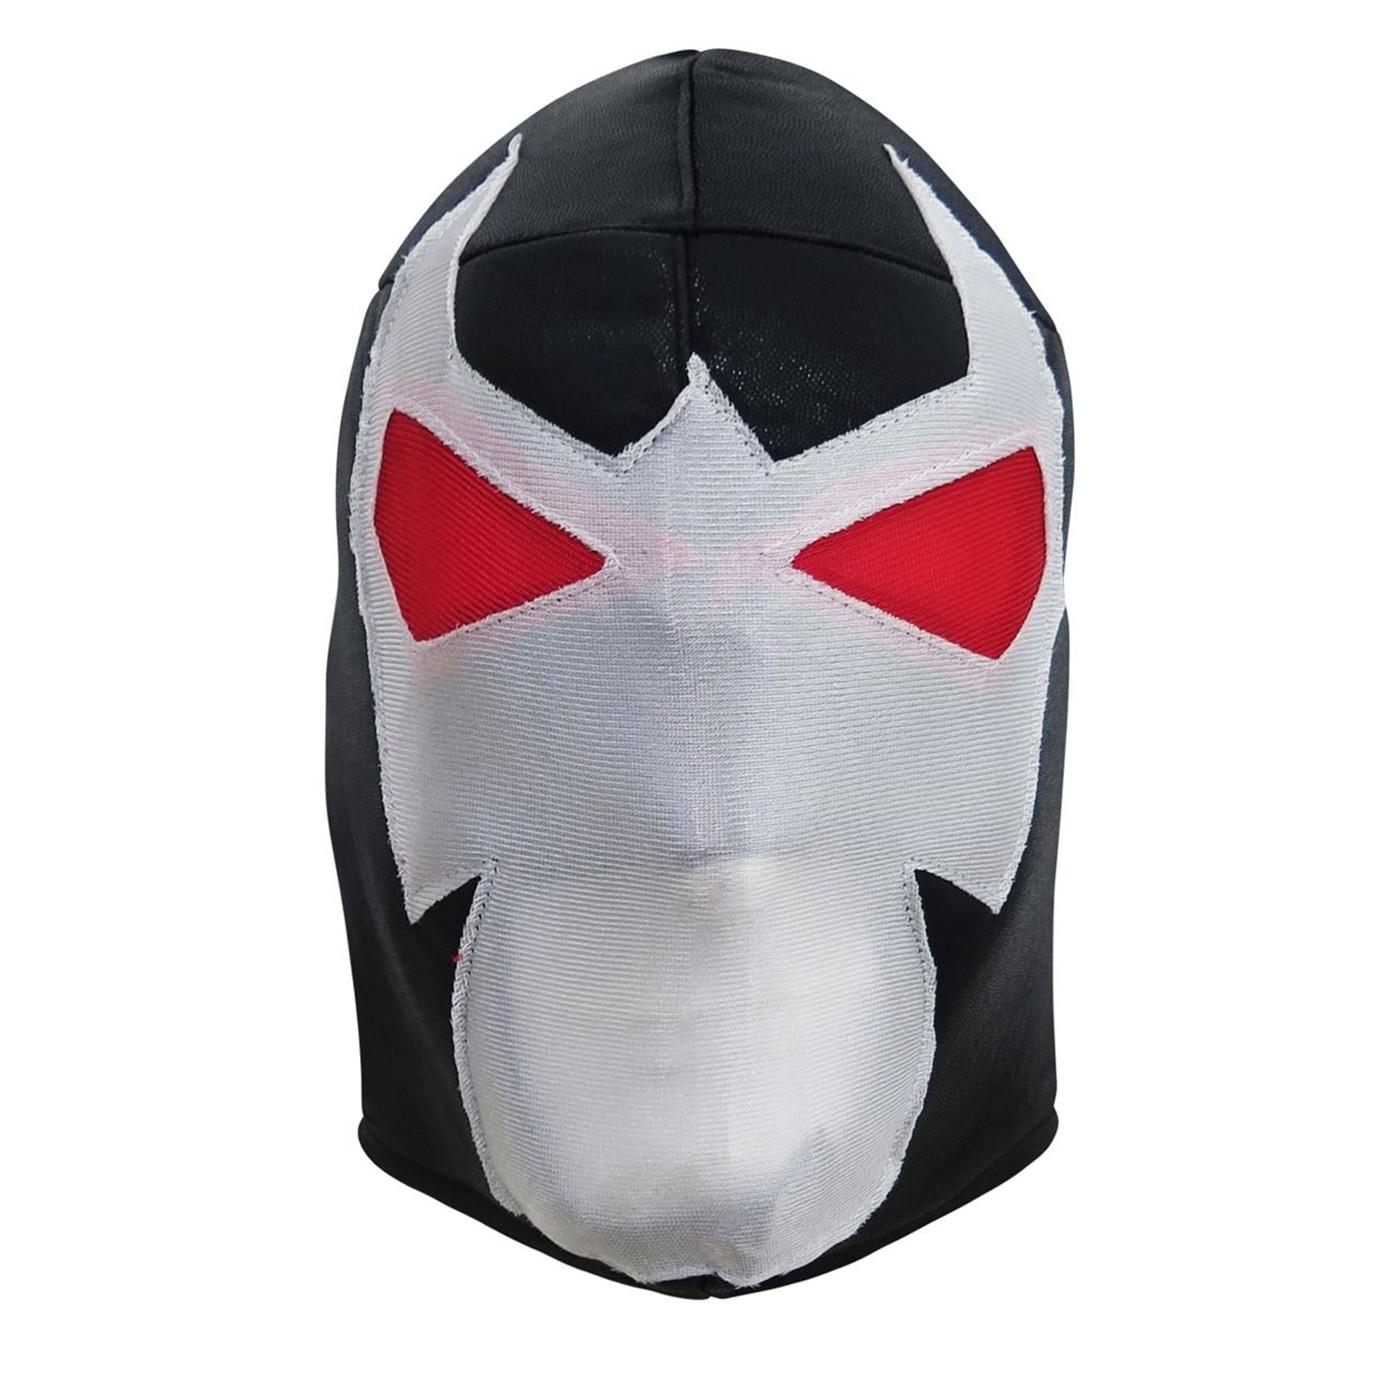 Bane Costume Mask